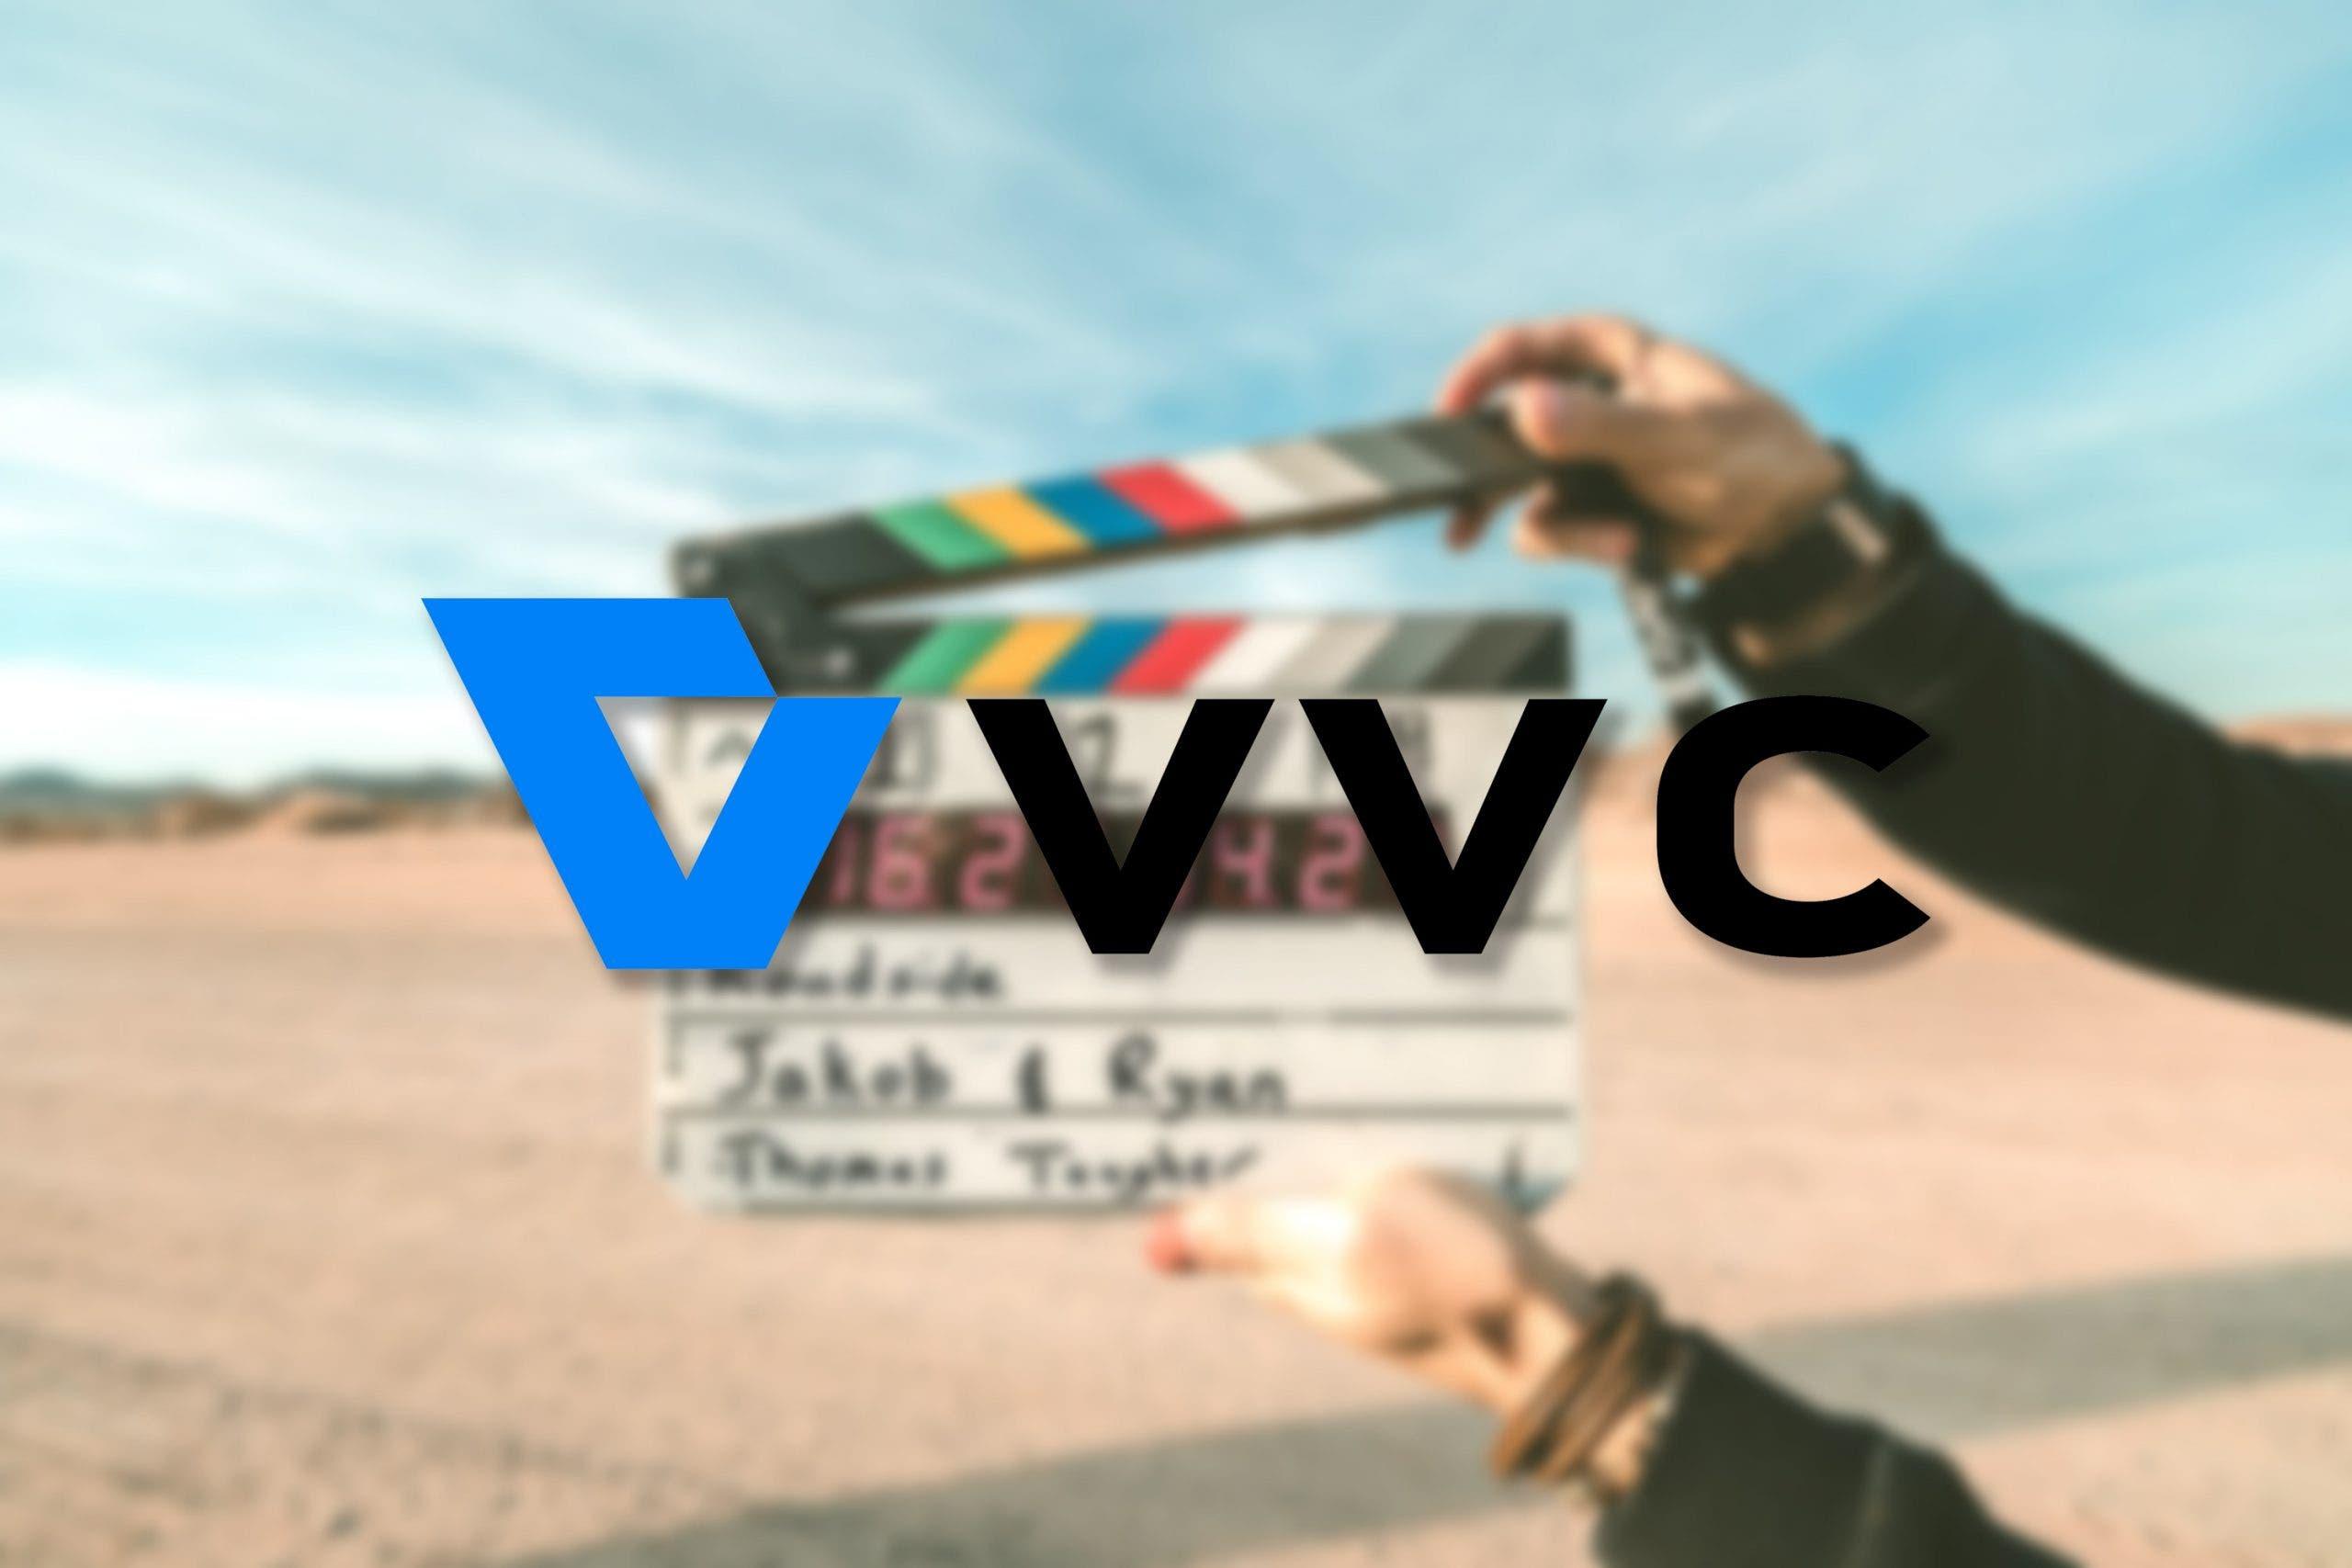 H.266/Versatile Video Coding/VVC codec